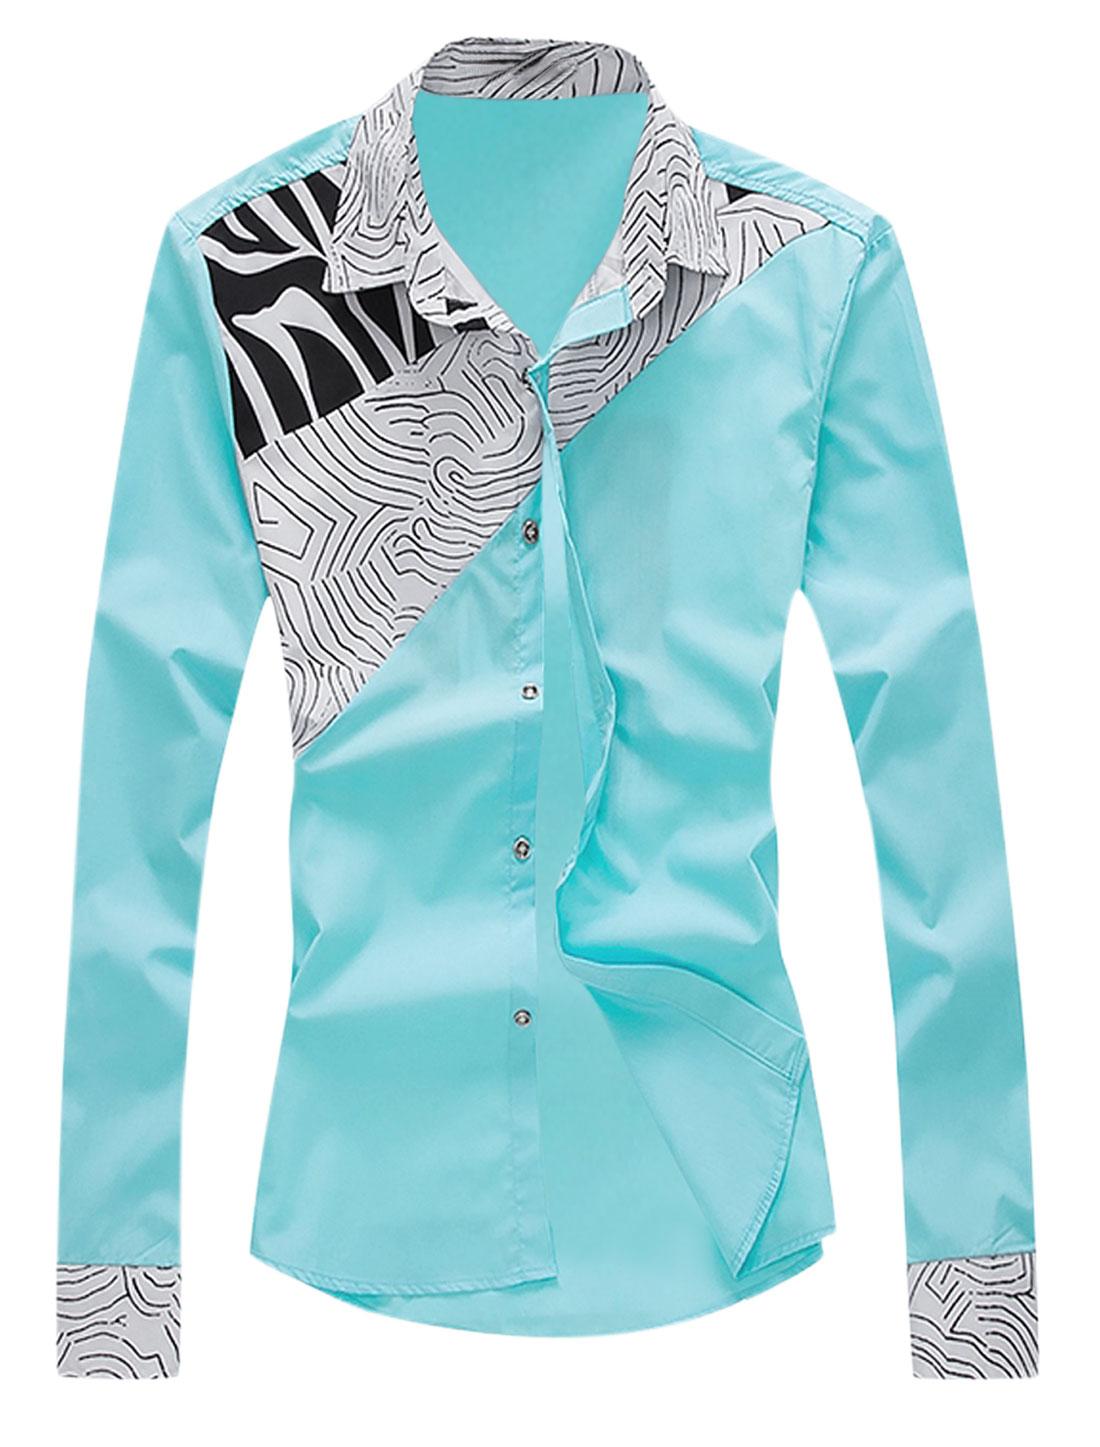 Men Long Sleeve Point Collar Novelty Prints Shirt Light Aqua M